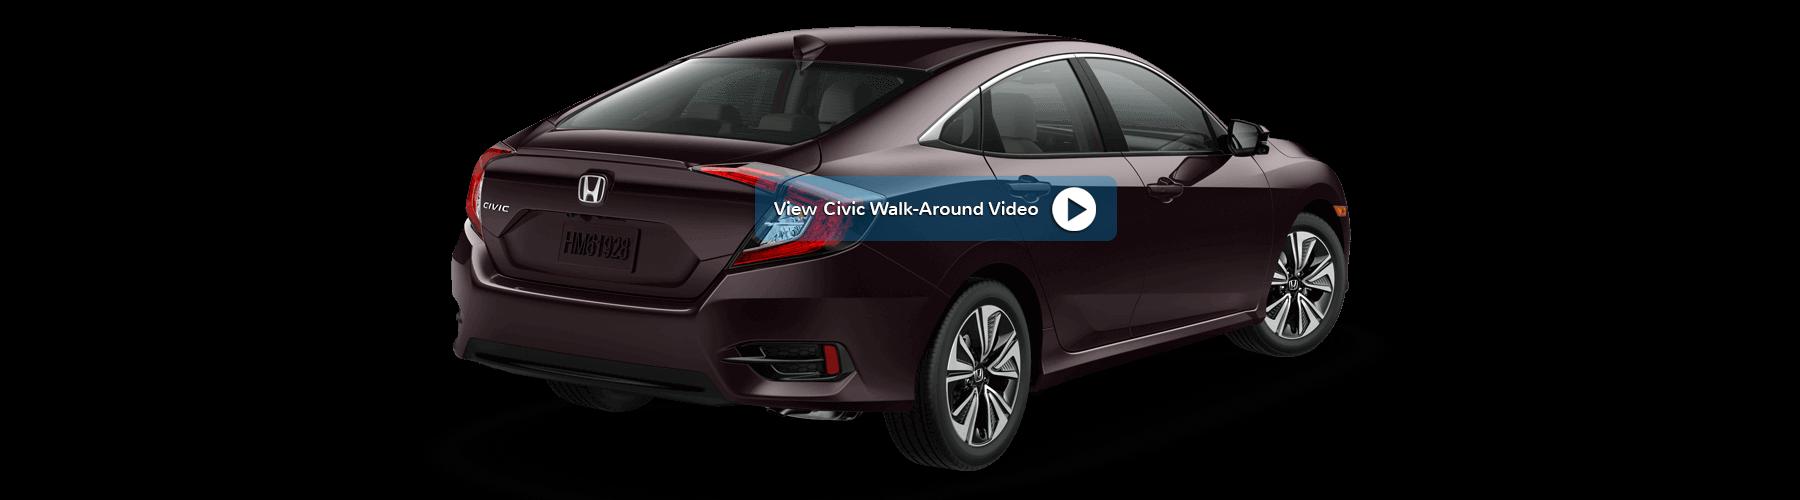 2017 Honda Civic Sedan Rear Angle